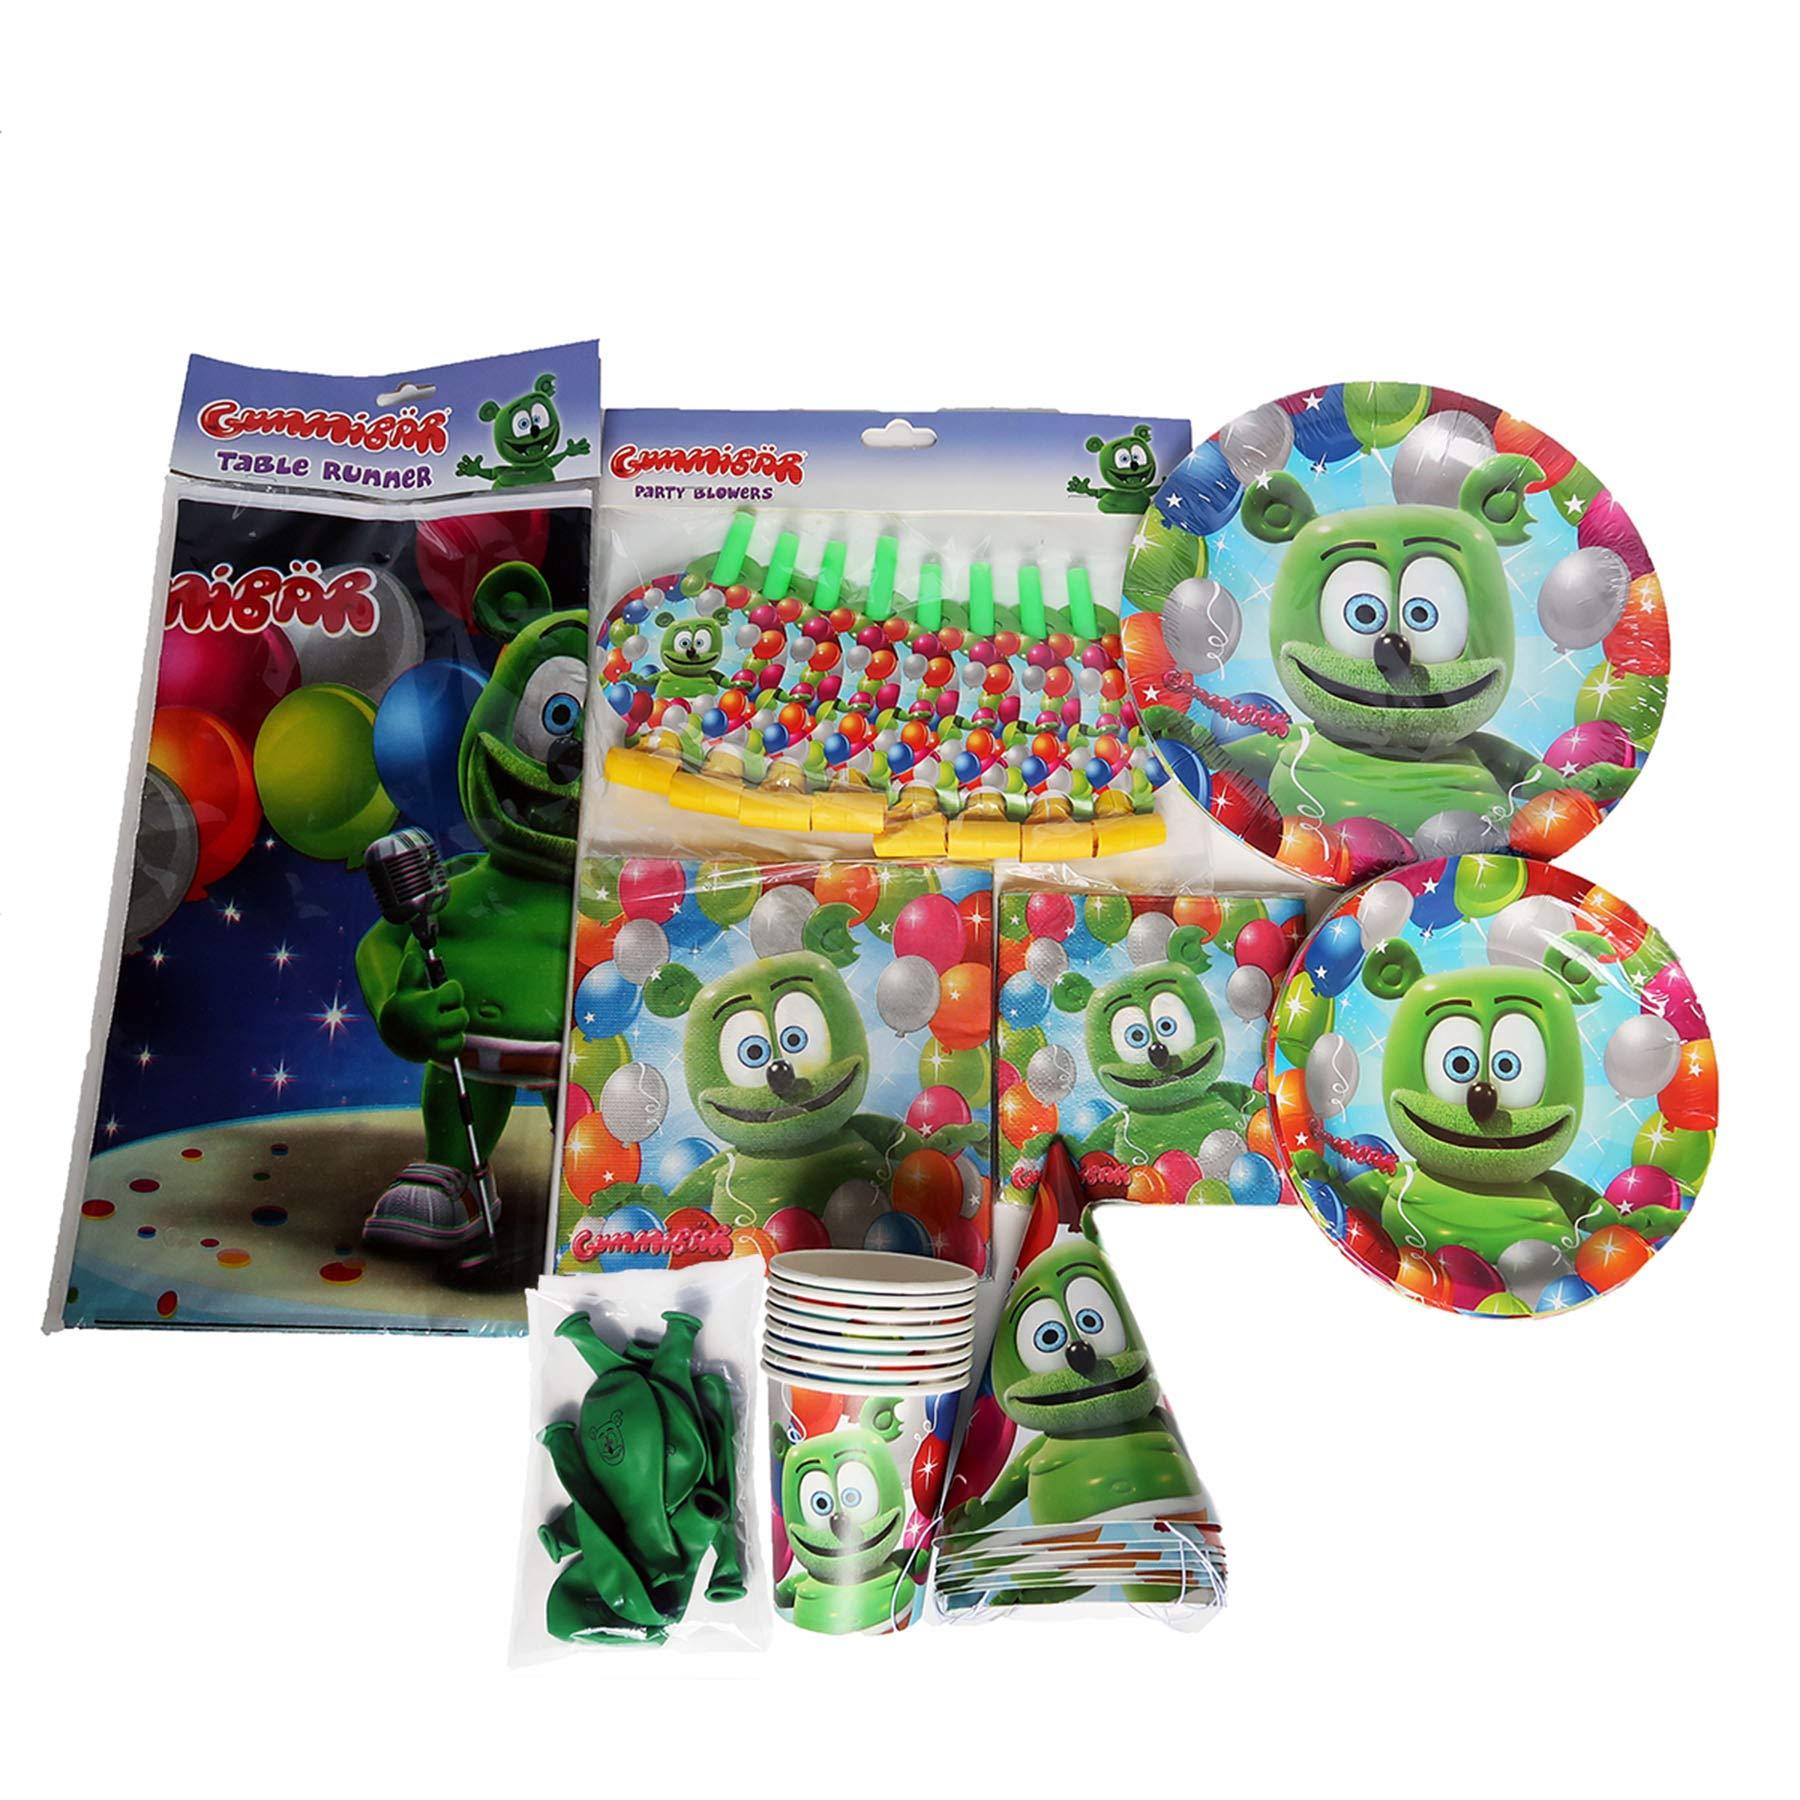 Phenomenal Amazon Com Gummibar The Gummy Bear Birthday Party Supplies Funny Birthday Cards Online Benoljebrpdamsfinfo